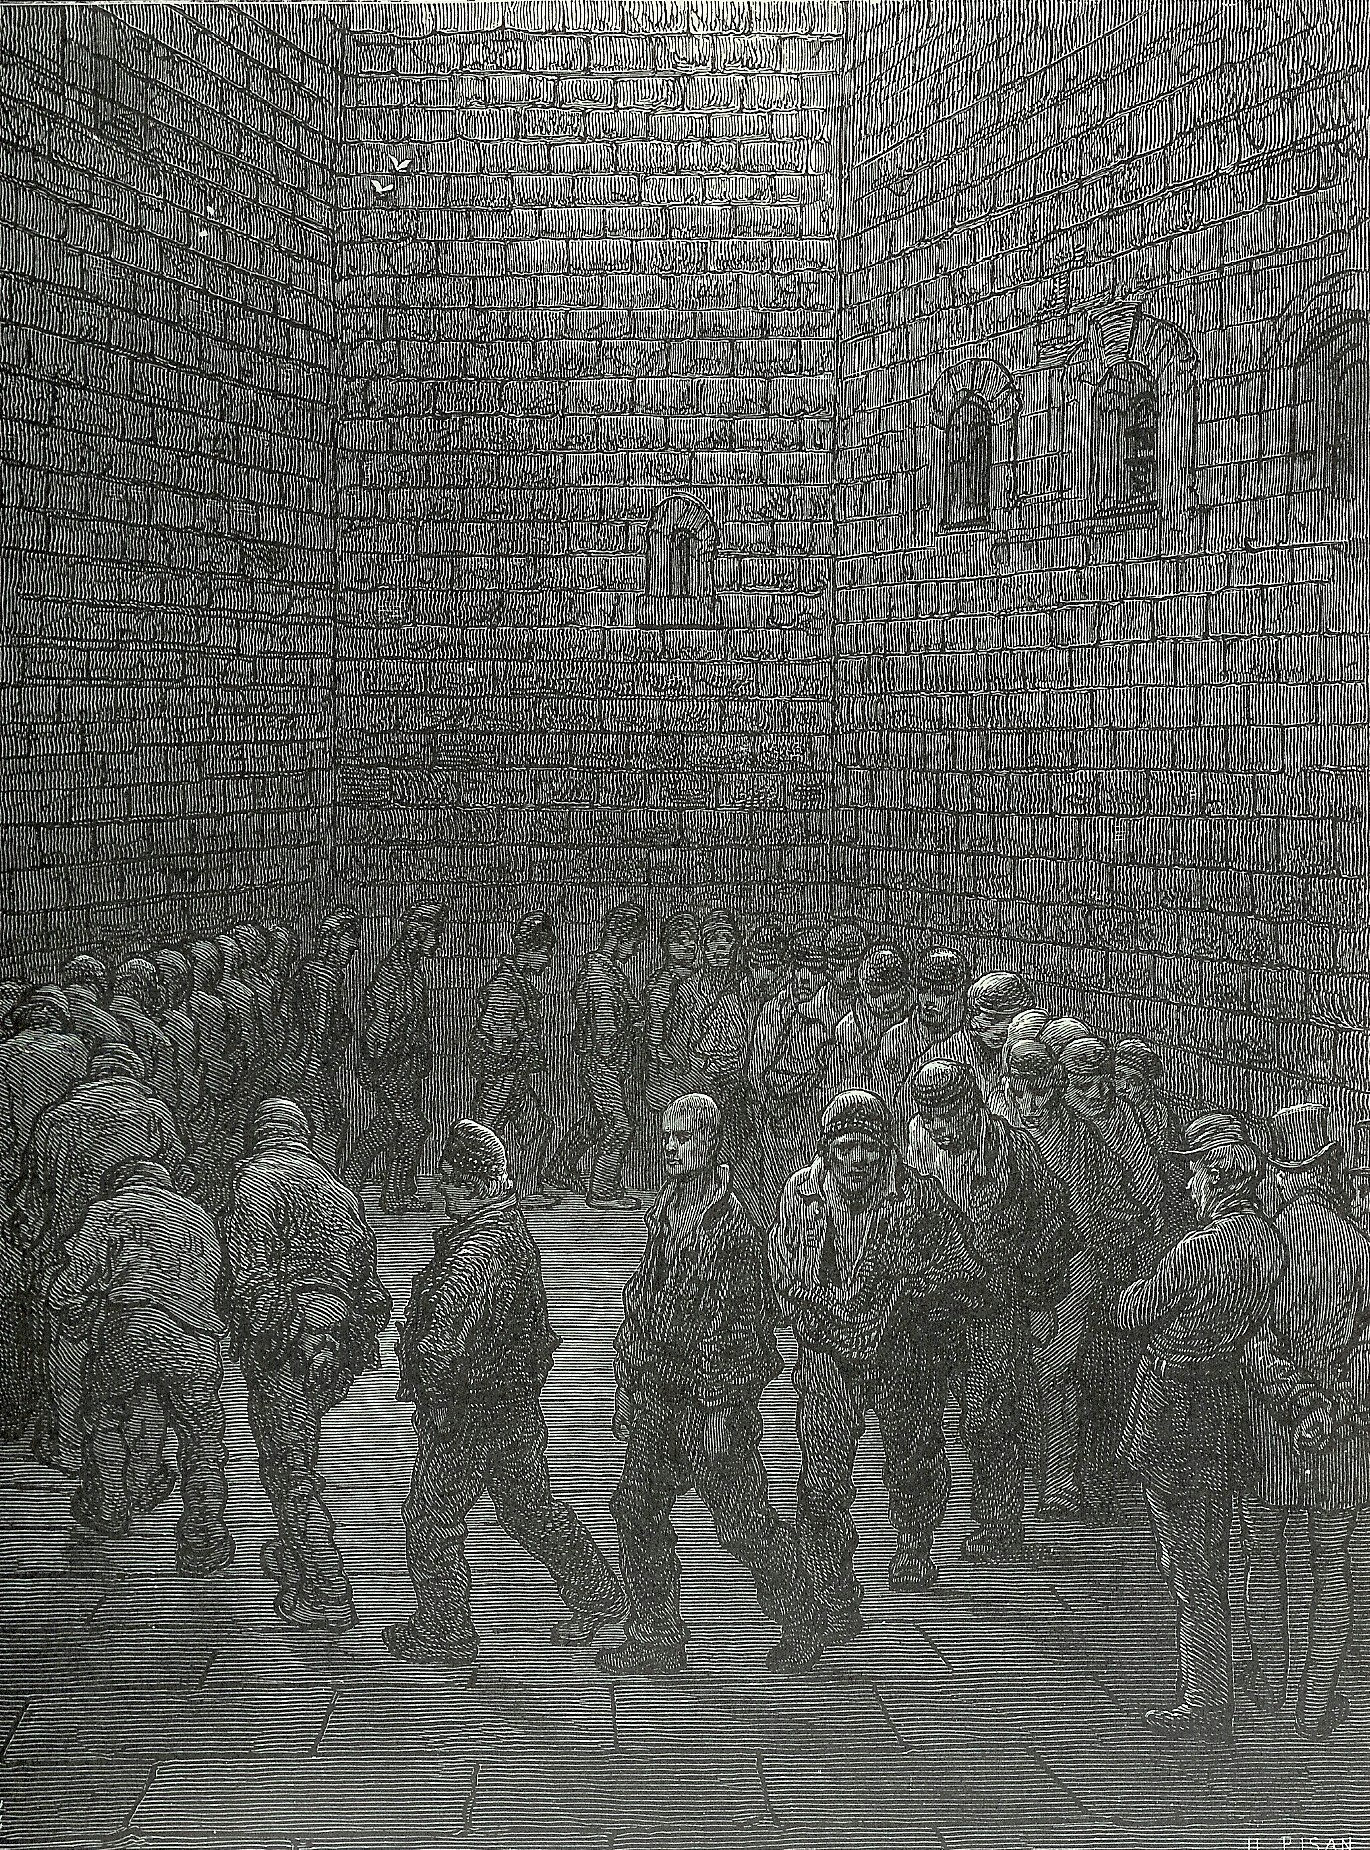 Newgate-prison-exercise-yard.jpg